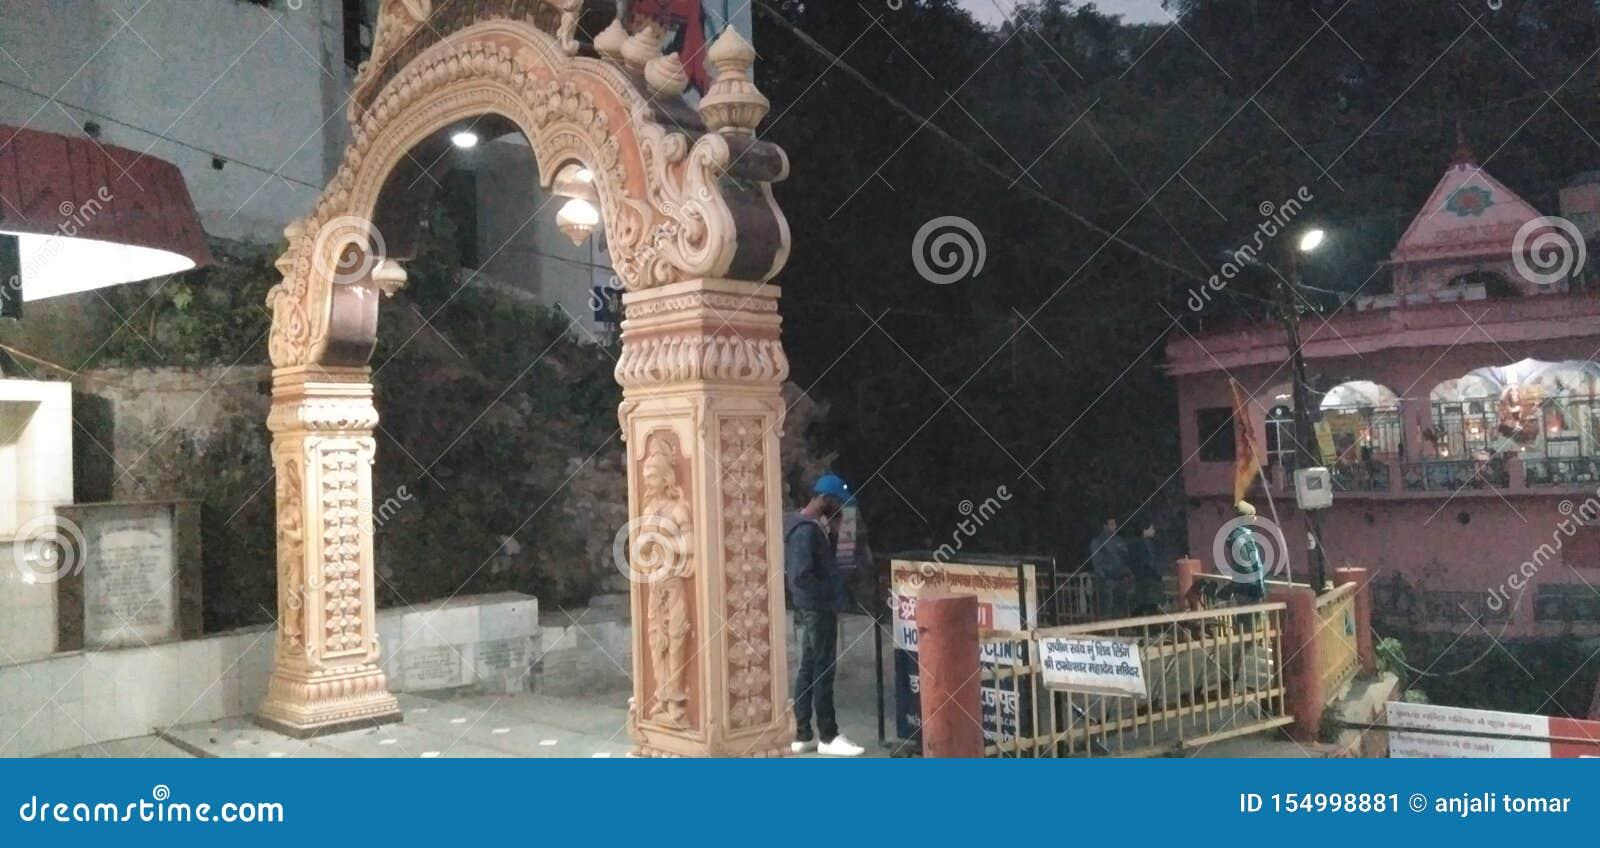 This image Shiv temple in india dehradun uttarakhand